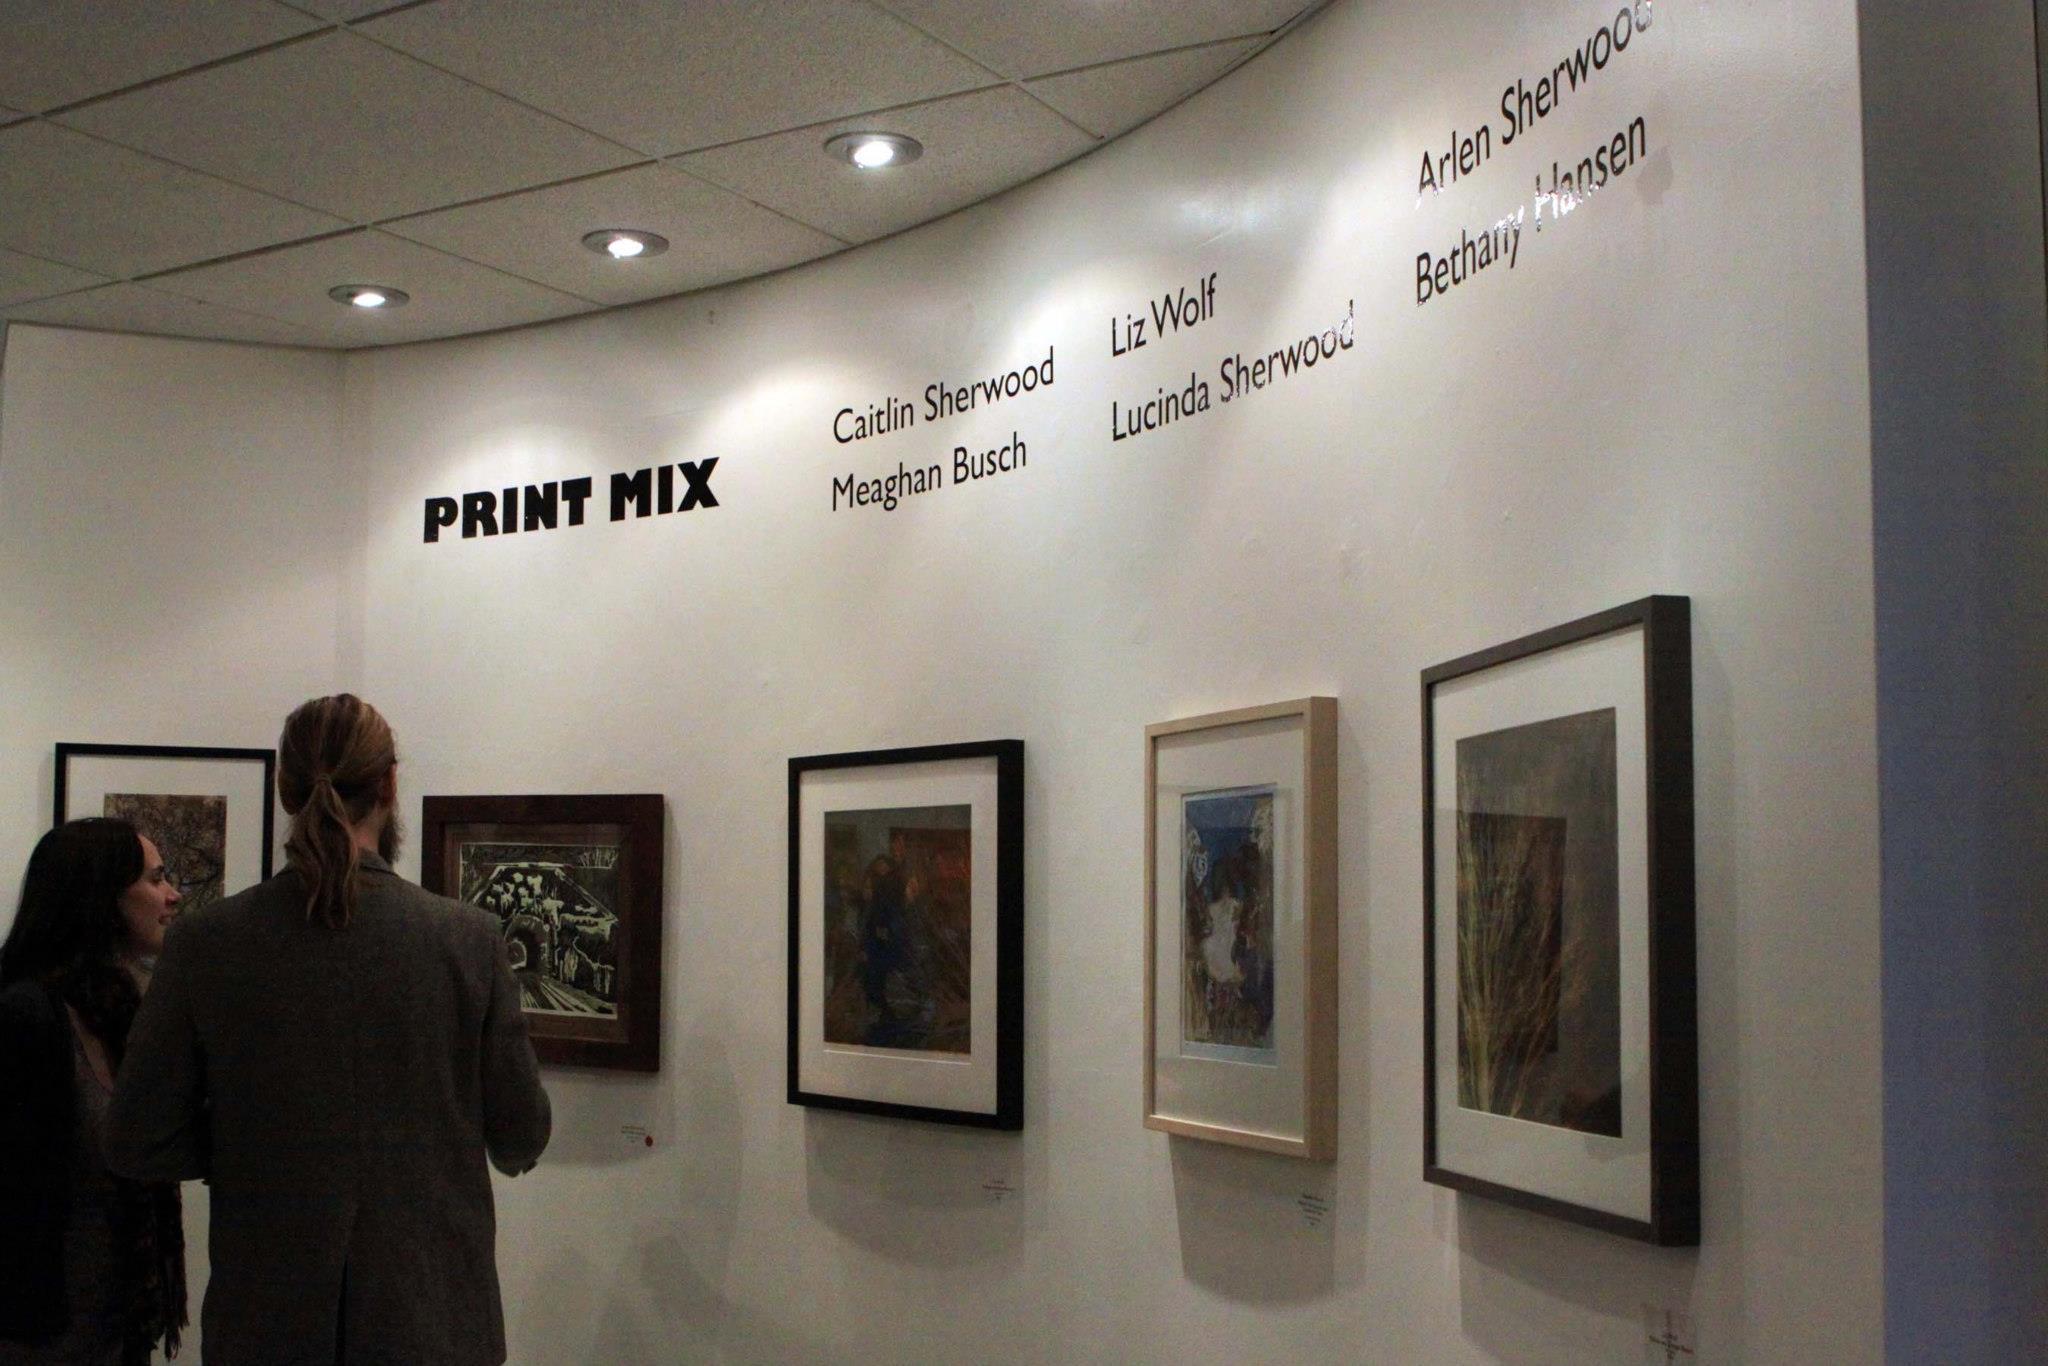 Print Mix